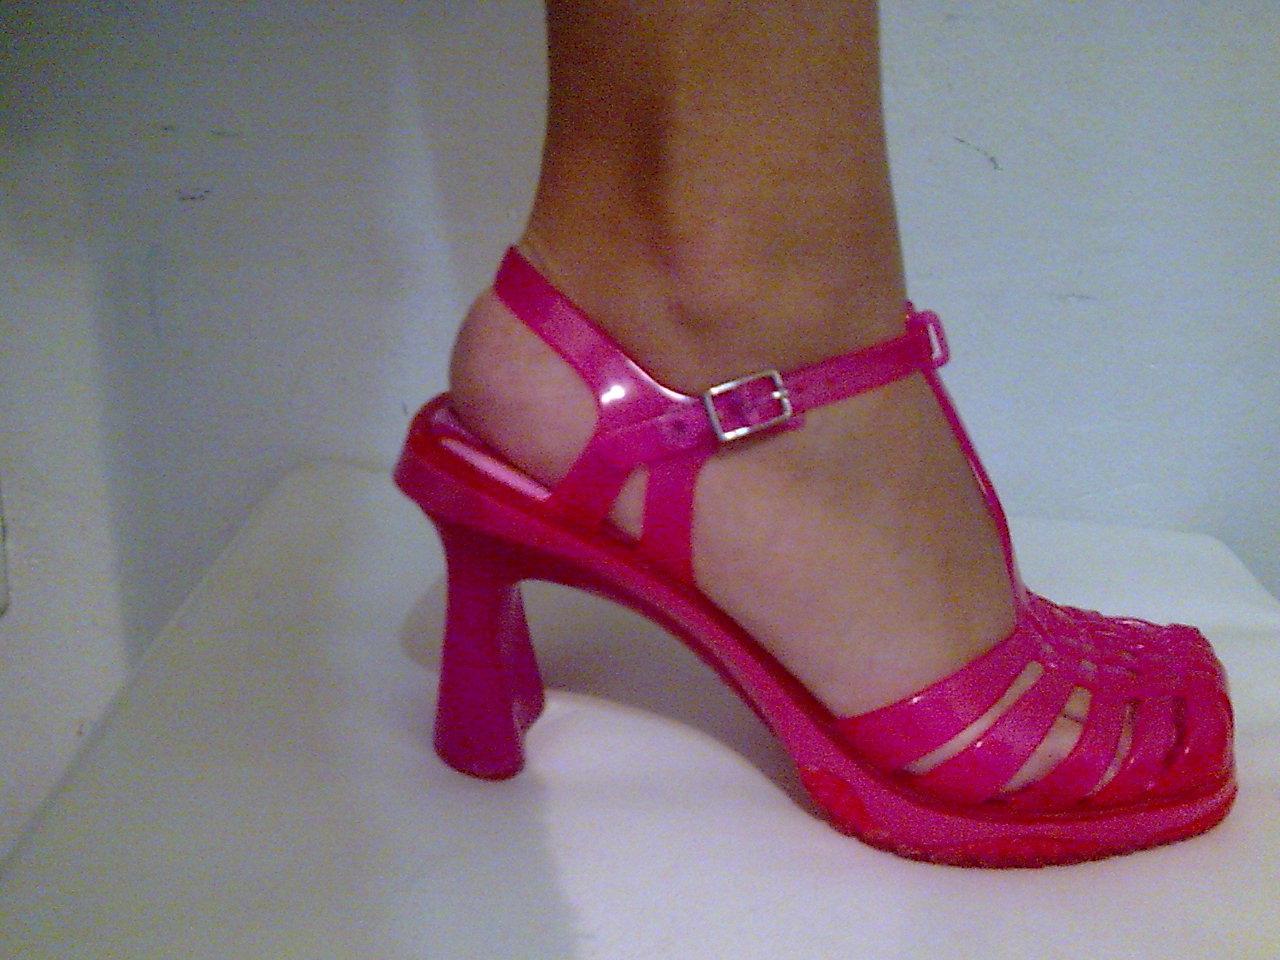 Sandália Melissa Vixen - 36 rosa - VENDIDA